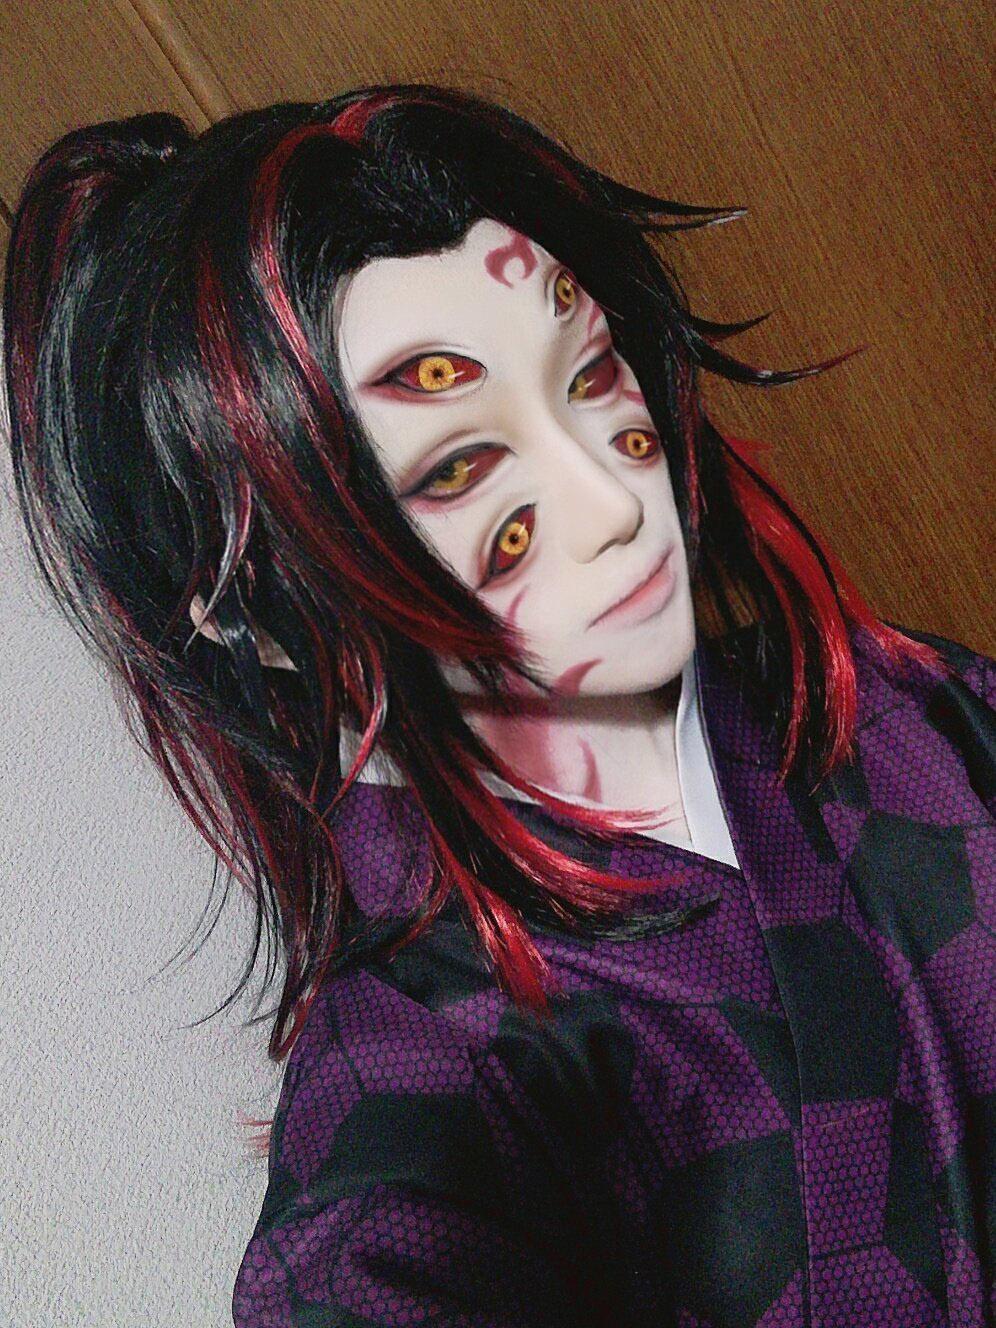 Photo of 23.73US $ 6% OFF | Anime Kokushibou / Tsugikuni Michikatsu long Wig Black red Cosplay Wig + Wig Cap Costume Demon Slayer: Kimetsu no Yaiba Wigs | Anime Costumes | –AliExpress